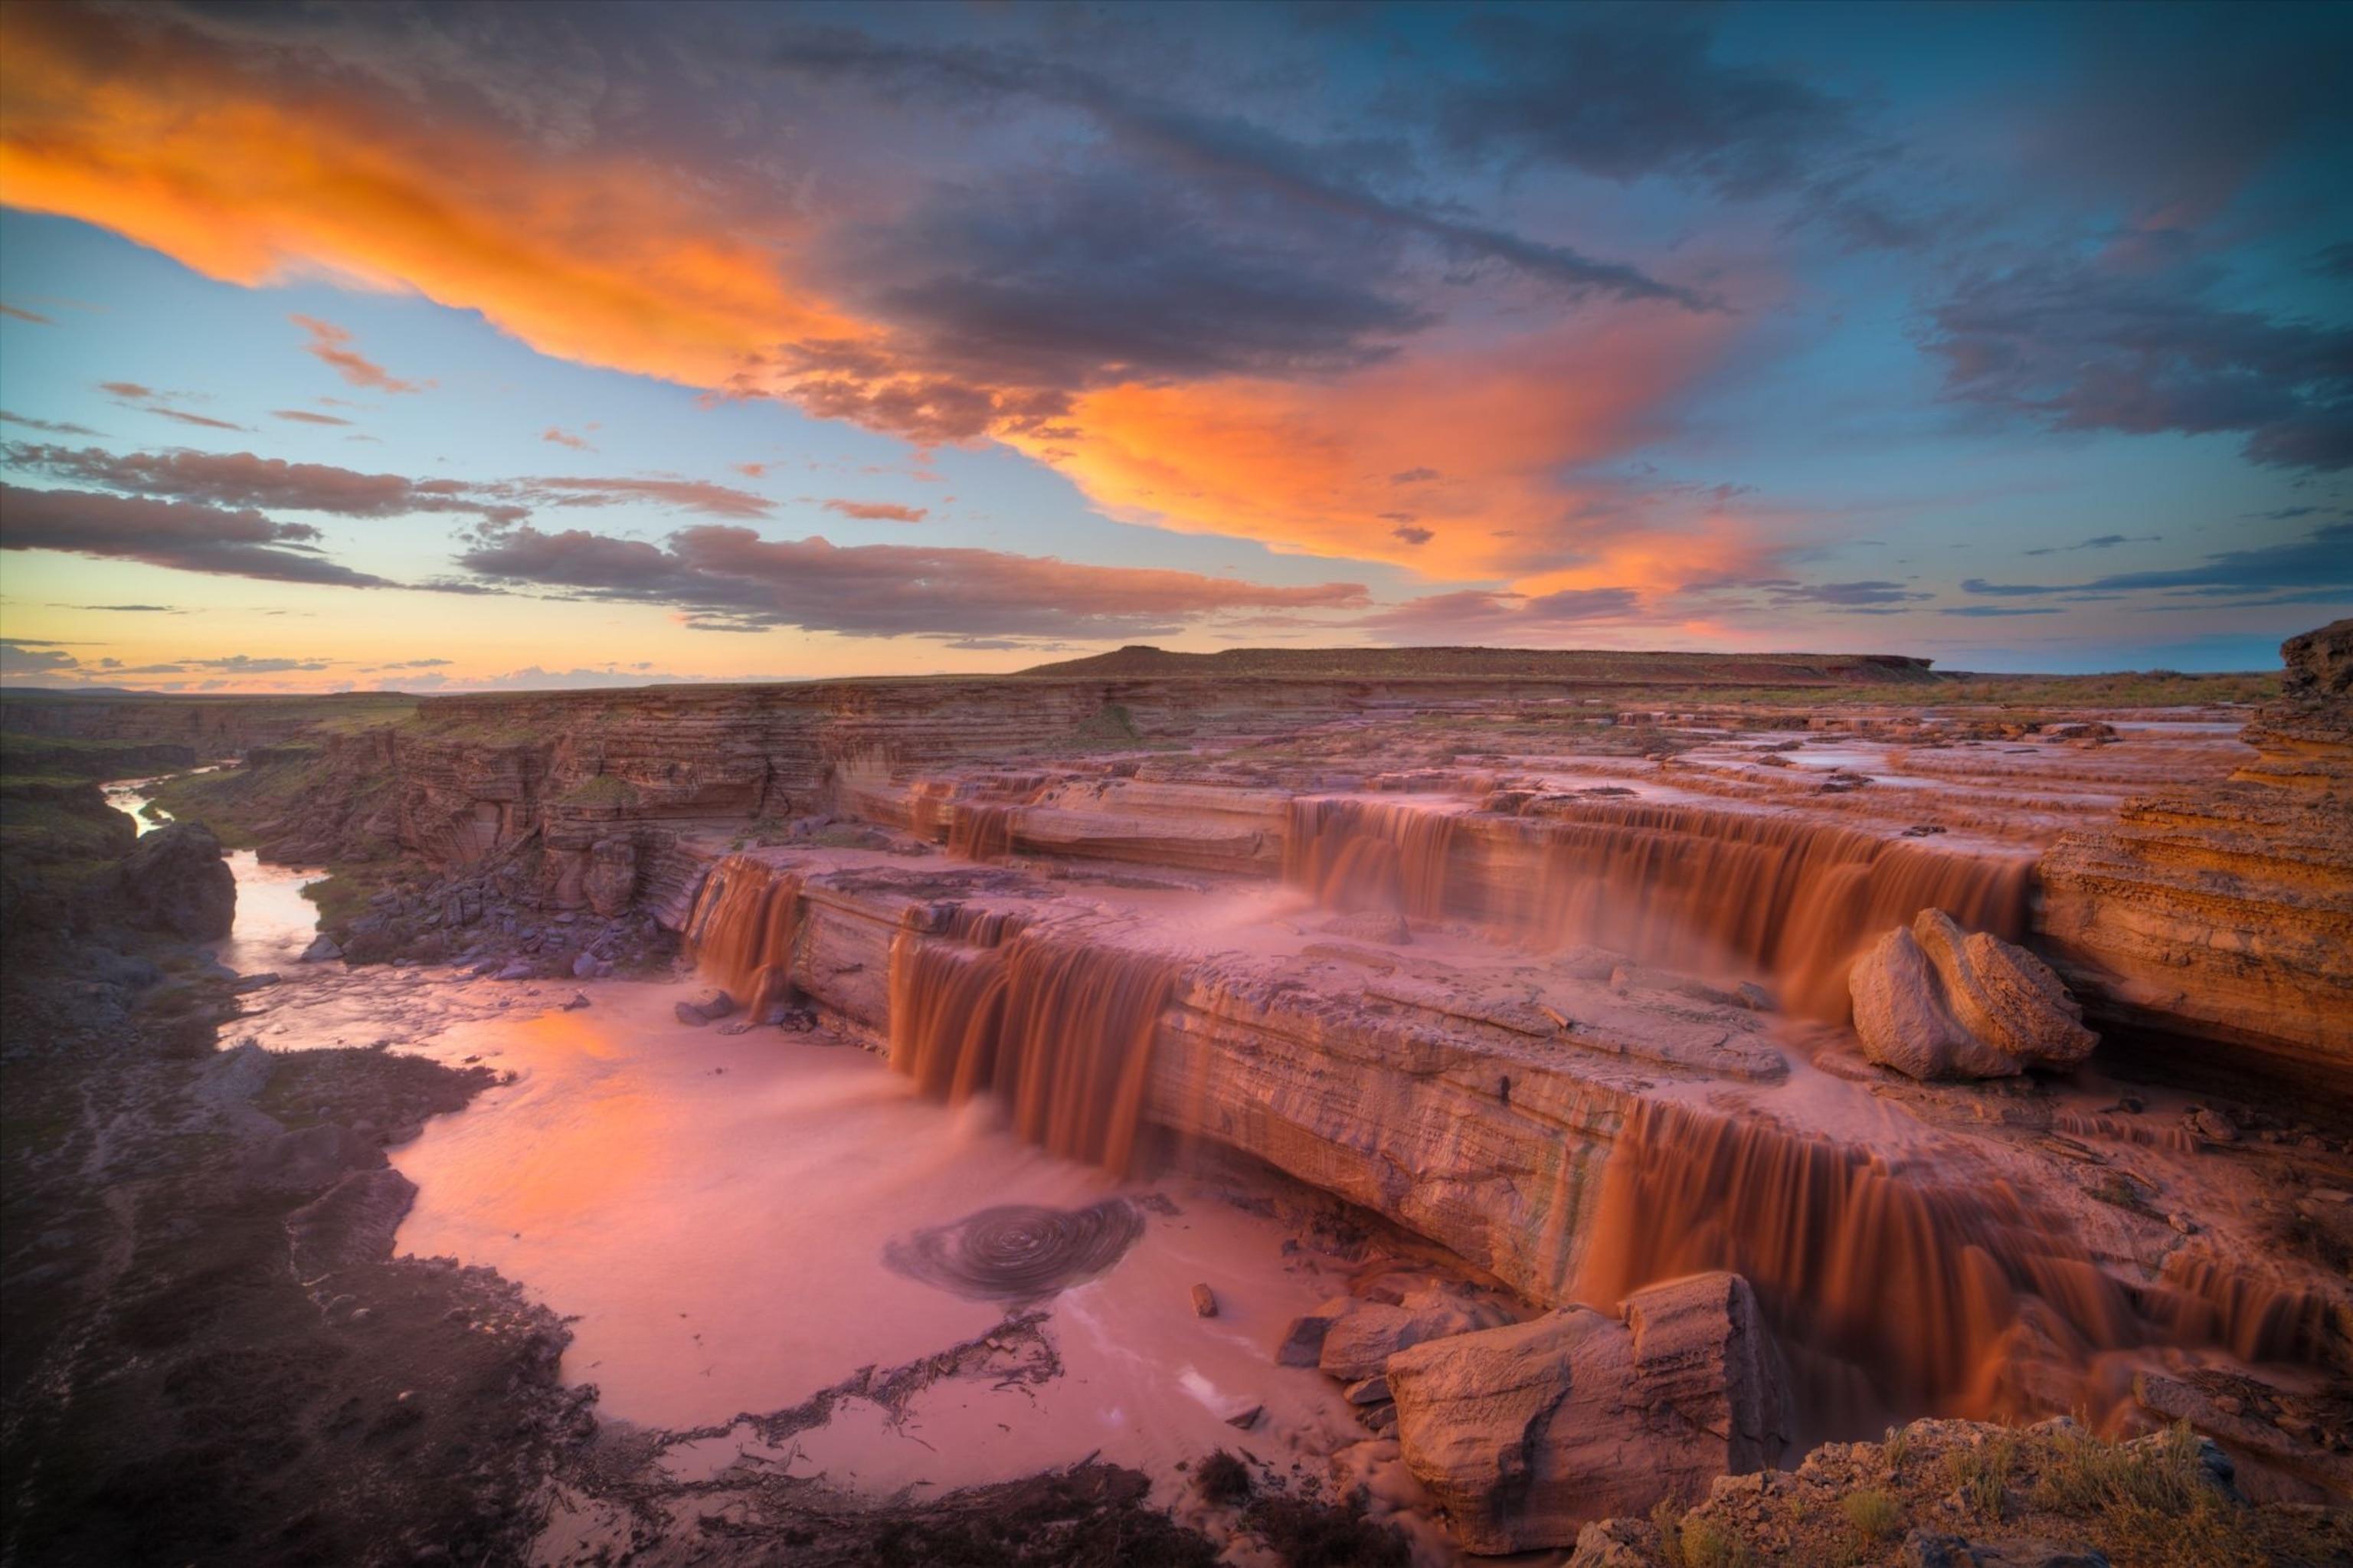 Arizona Sunset Image | National Geographic Your Shot Photo of the Day